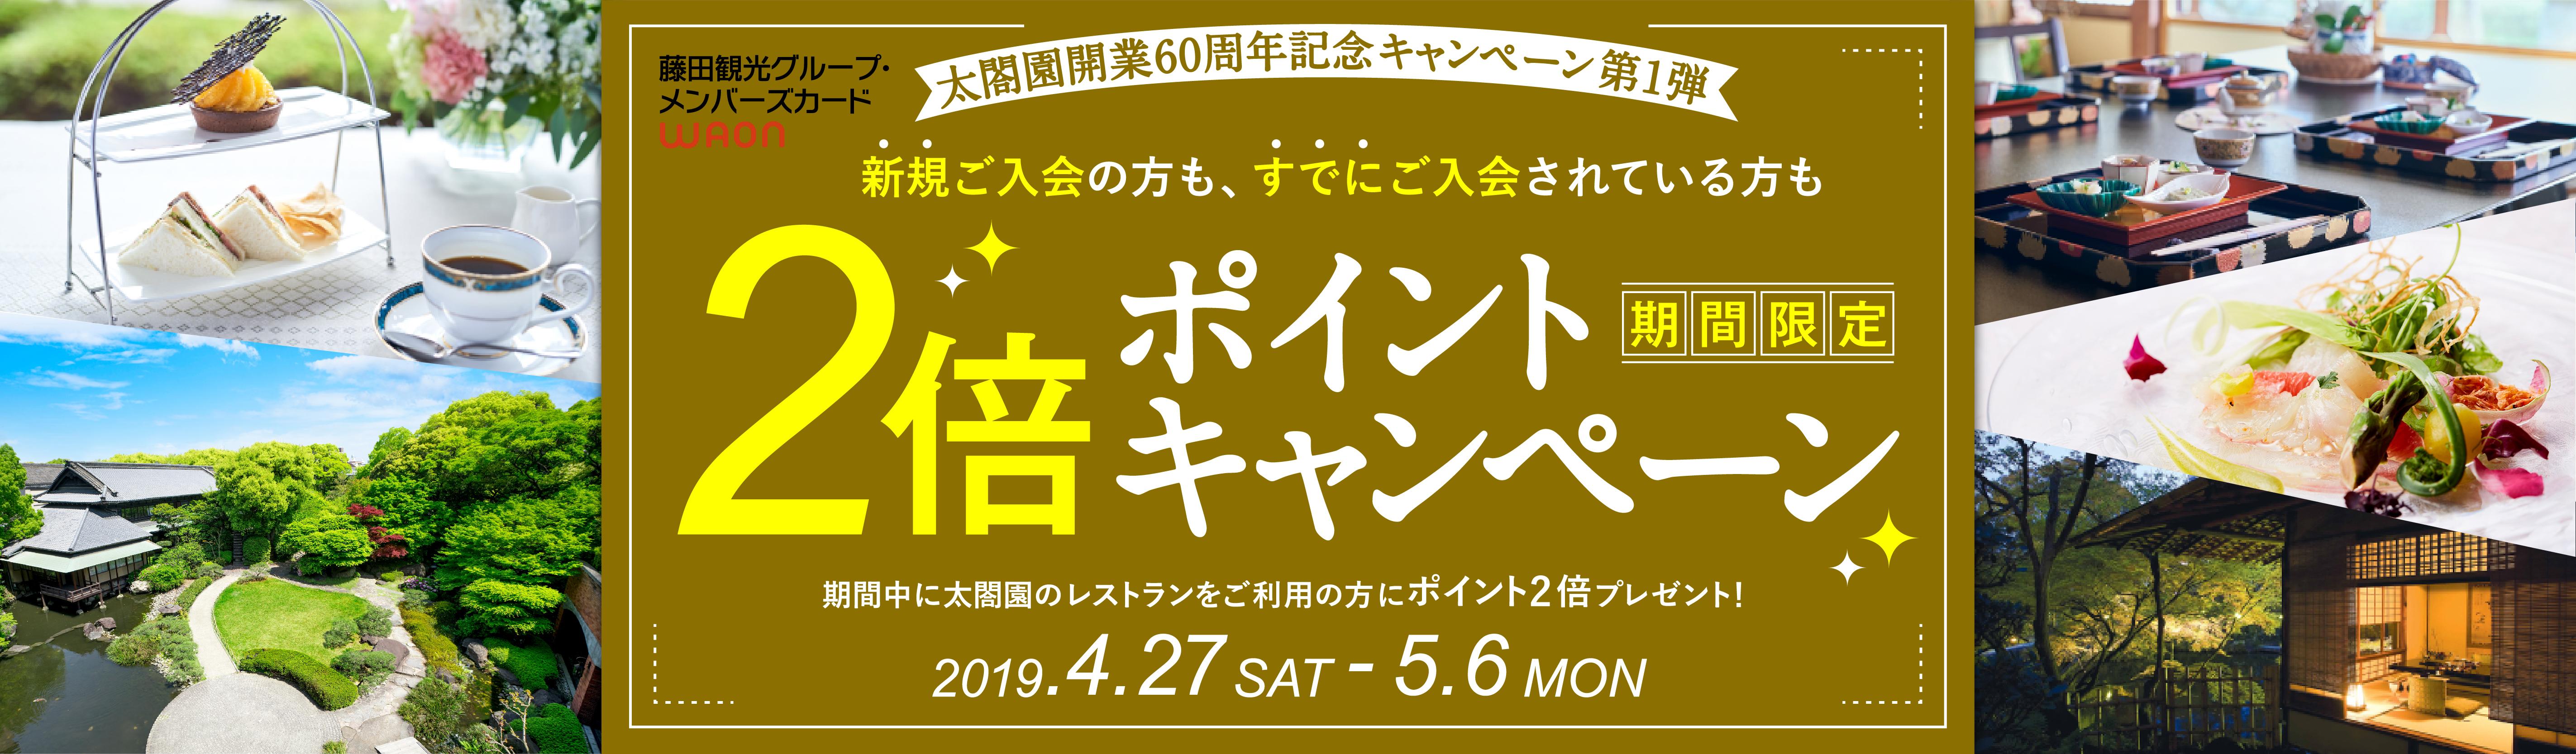 taikouen60th1366*400_0401